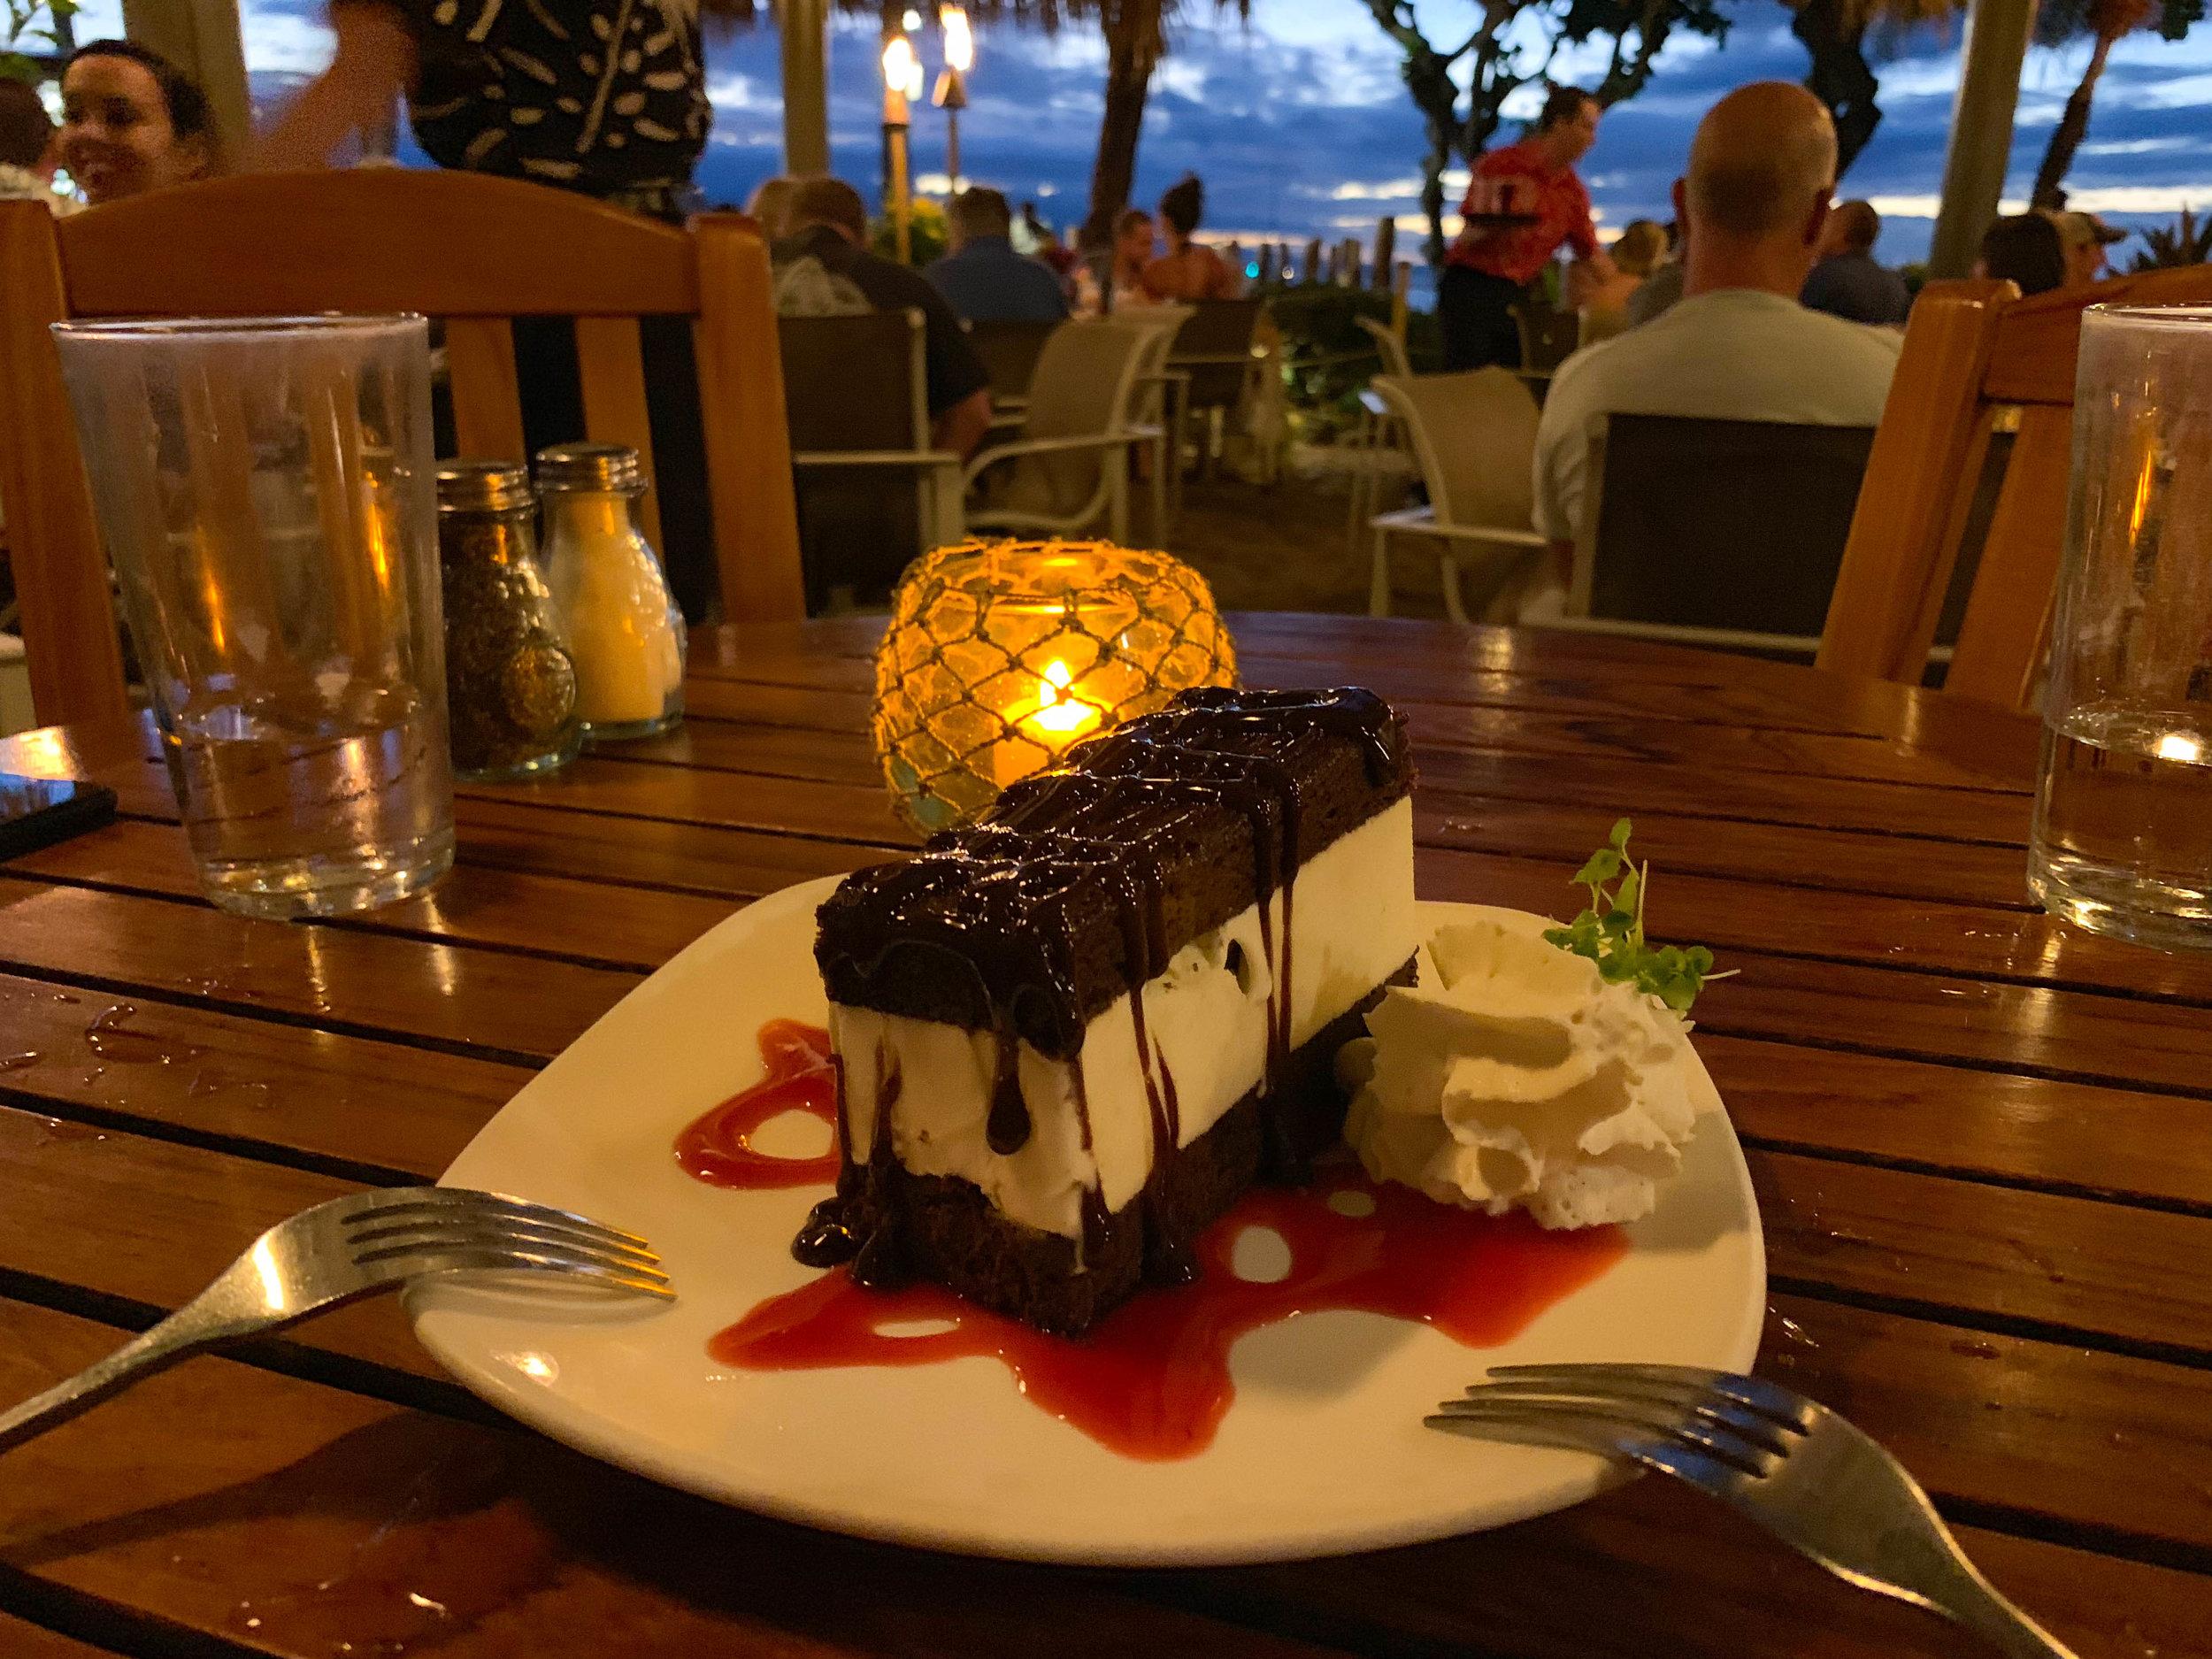 Maui_Hawaii_Ice_cream_sandwich.jpg